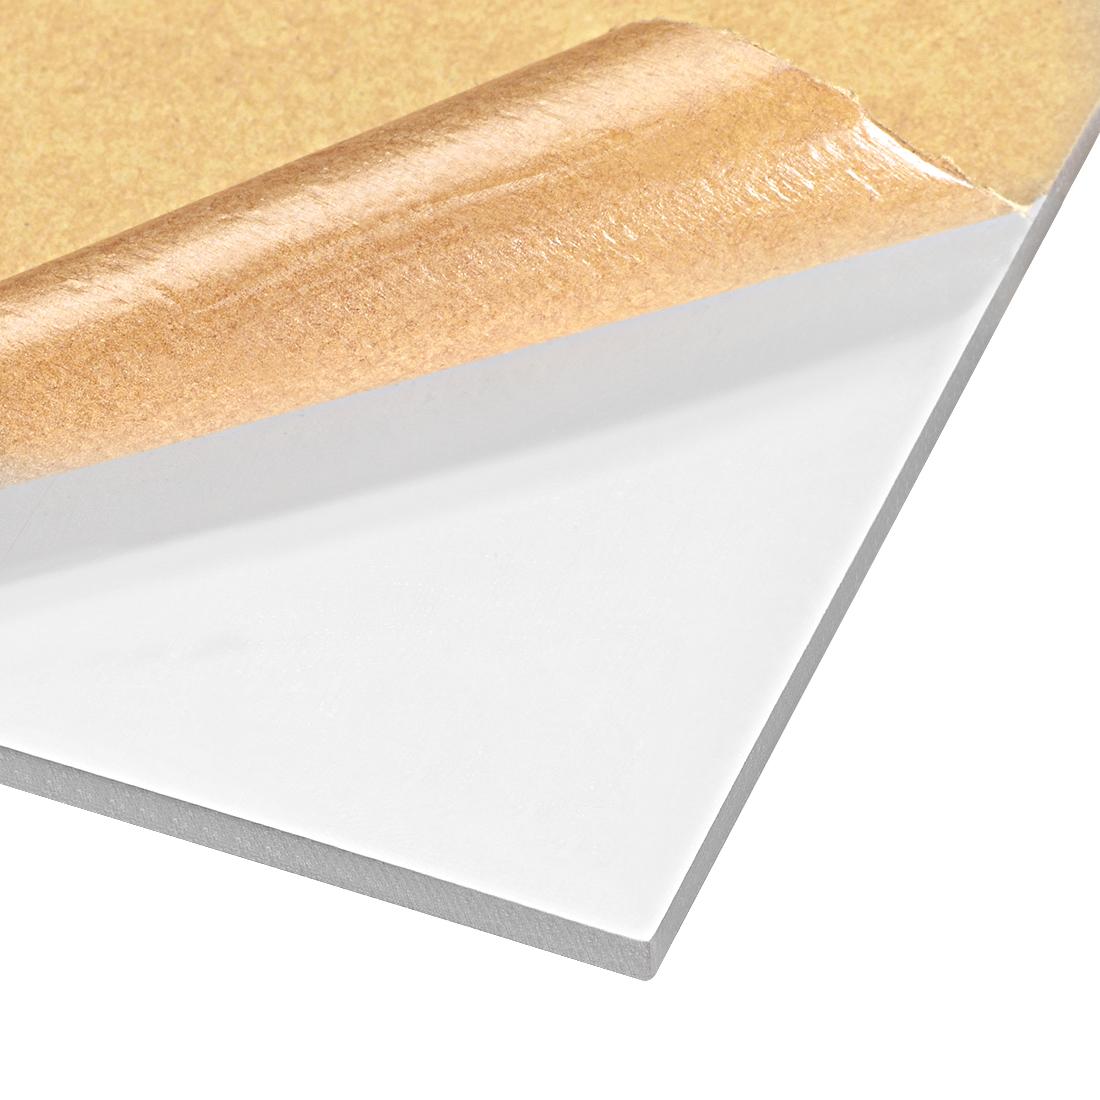 Acrylic Plexiglass Sheet,Clear,5mm Thick,30cm x 20cm,Plastic Board